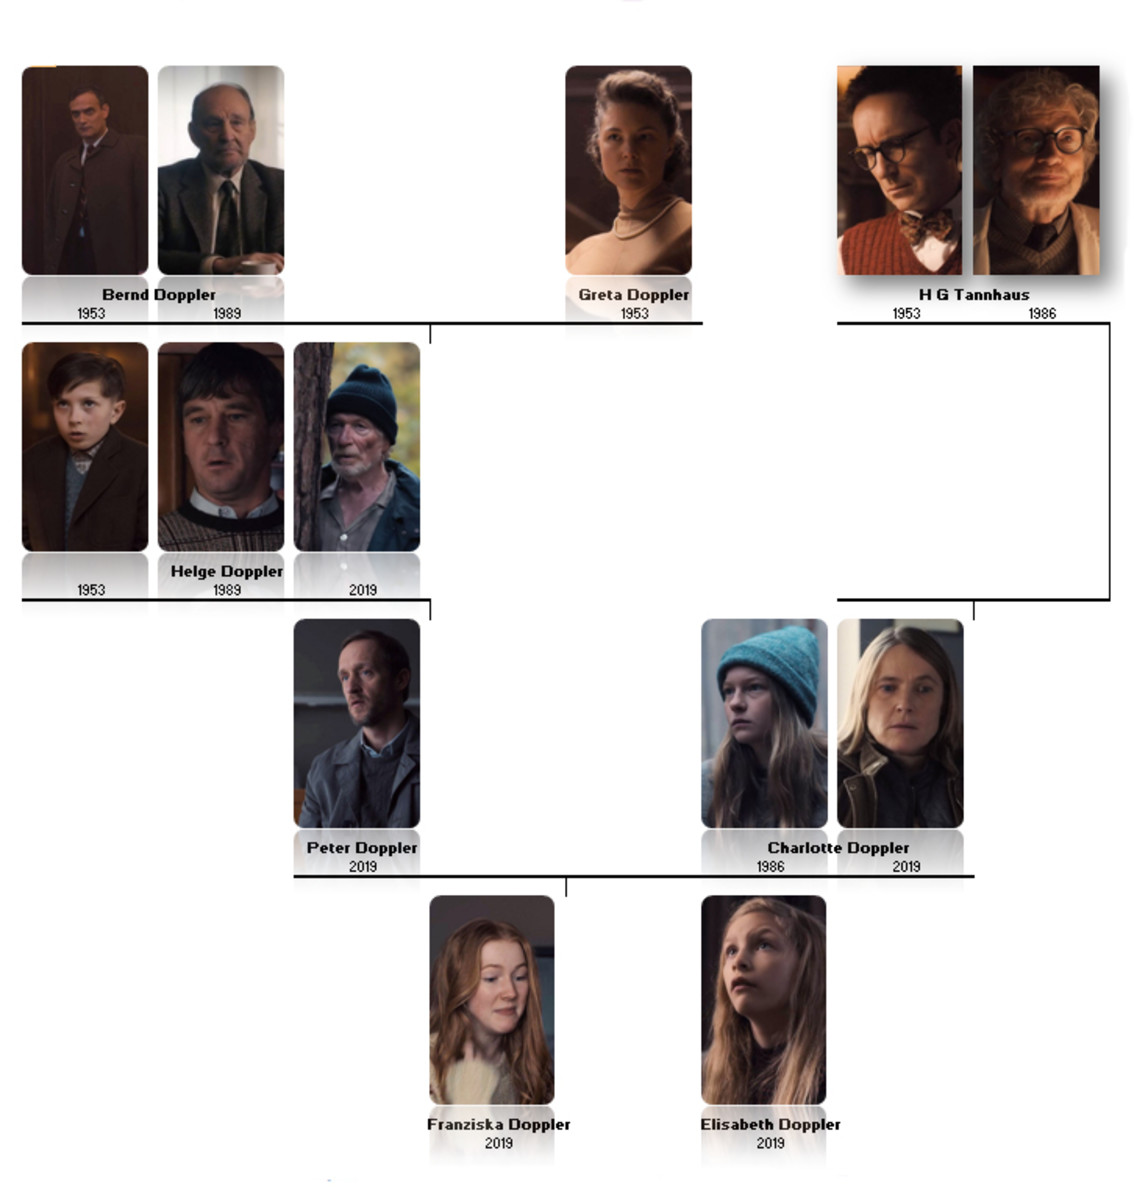 Doppler family tree from 'Dark' (2017), a Netflix Original Series.